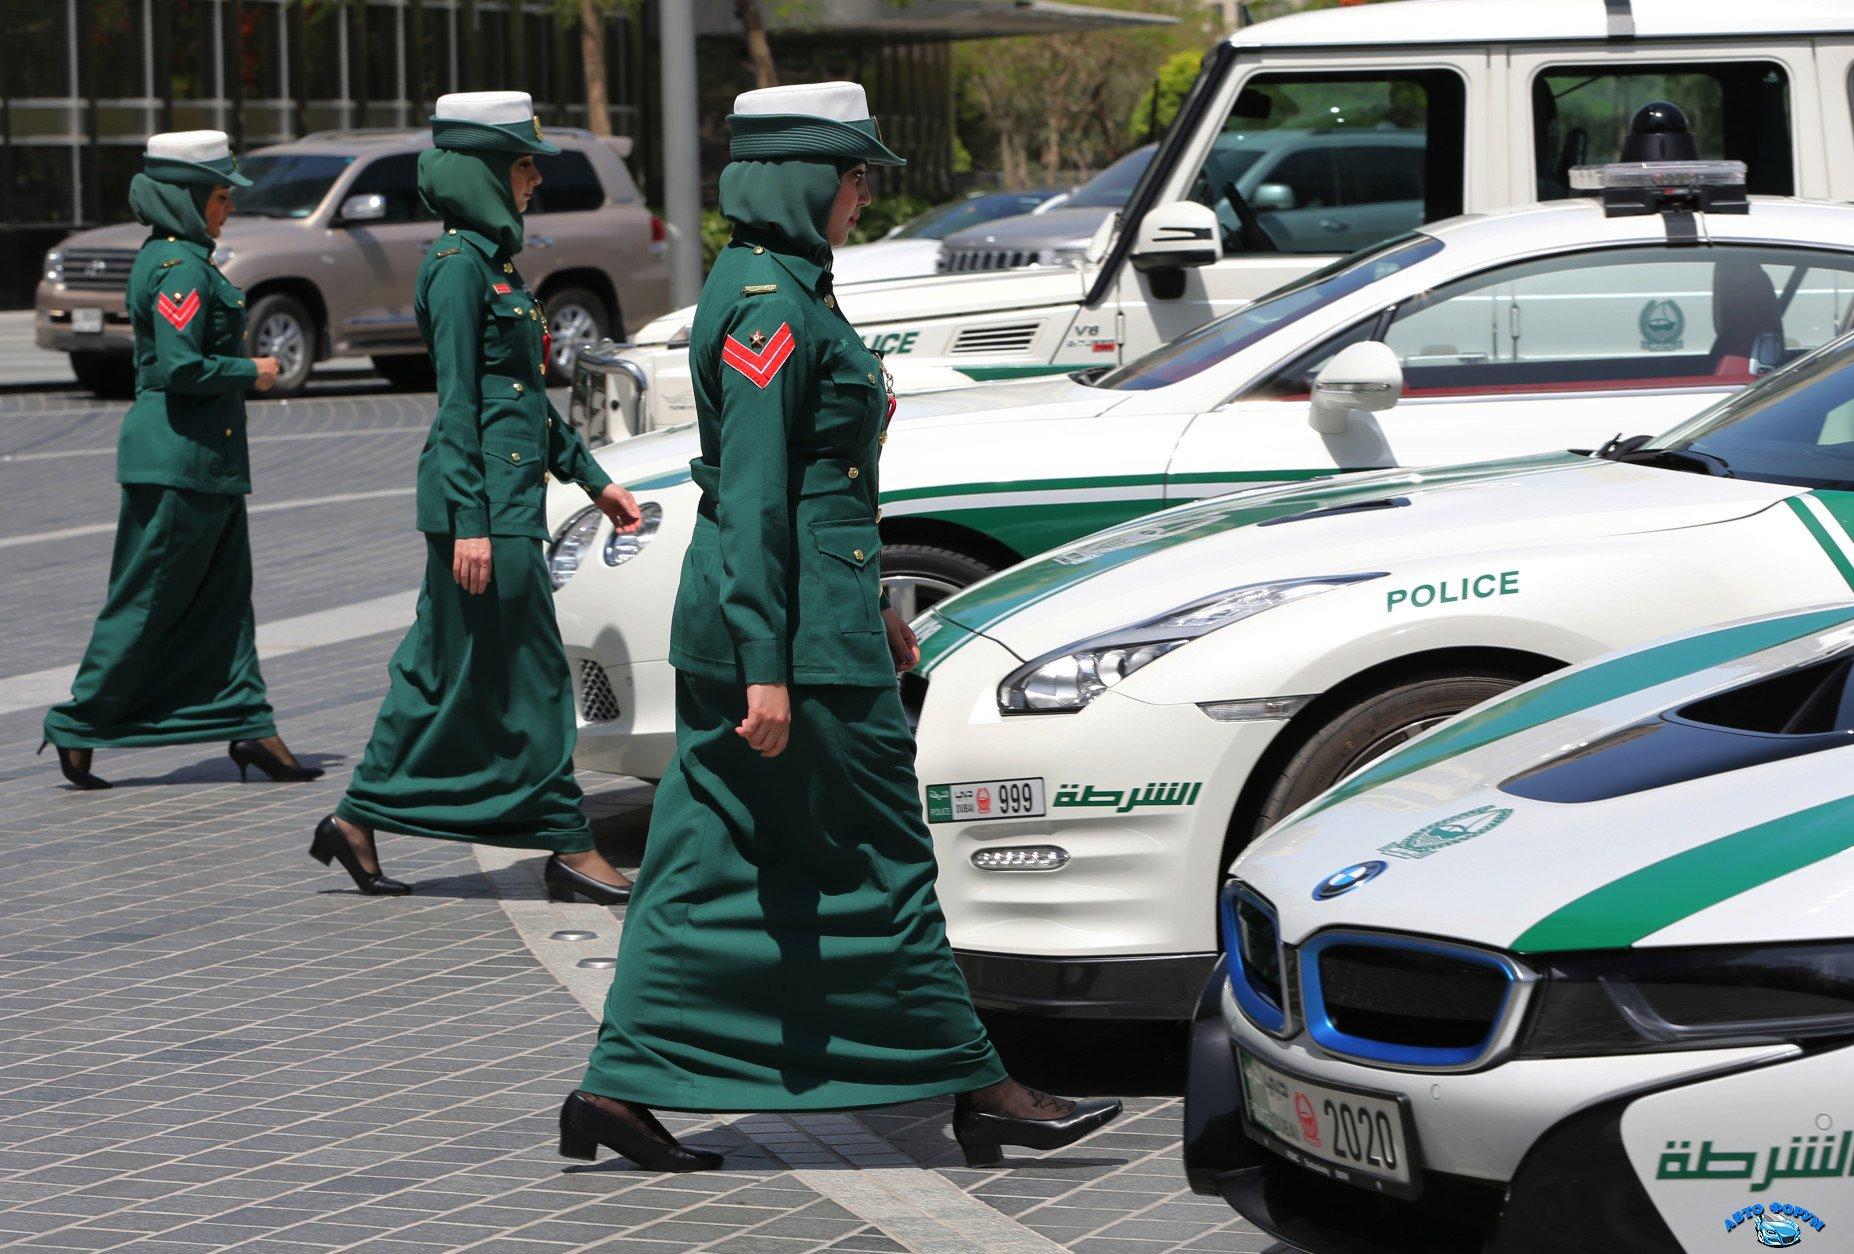 Mideast-Dubai-Police-Exotic-Cars1-1854x1254.jpeg